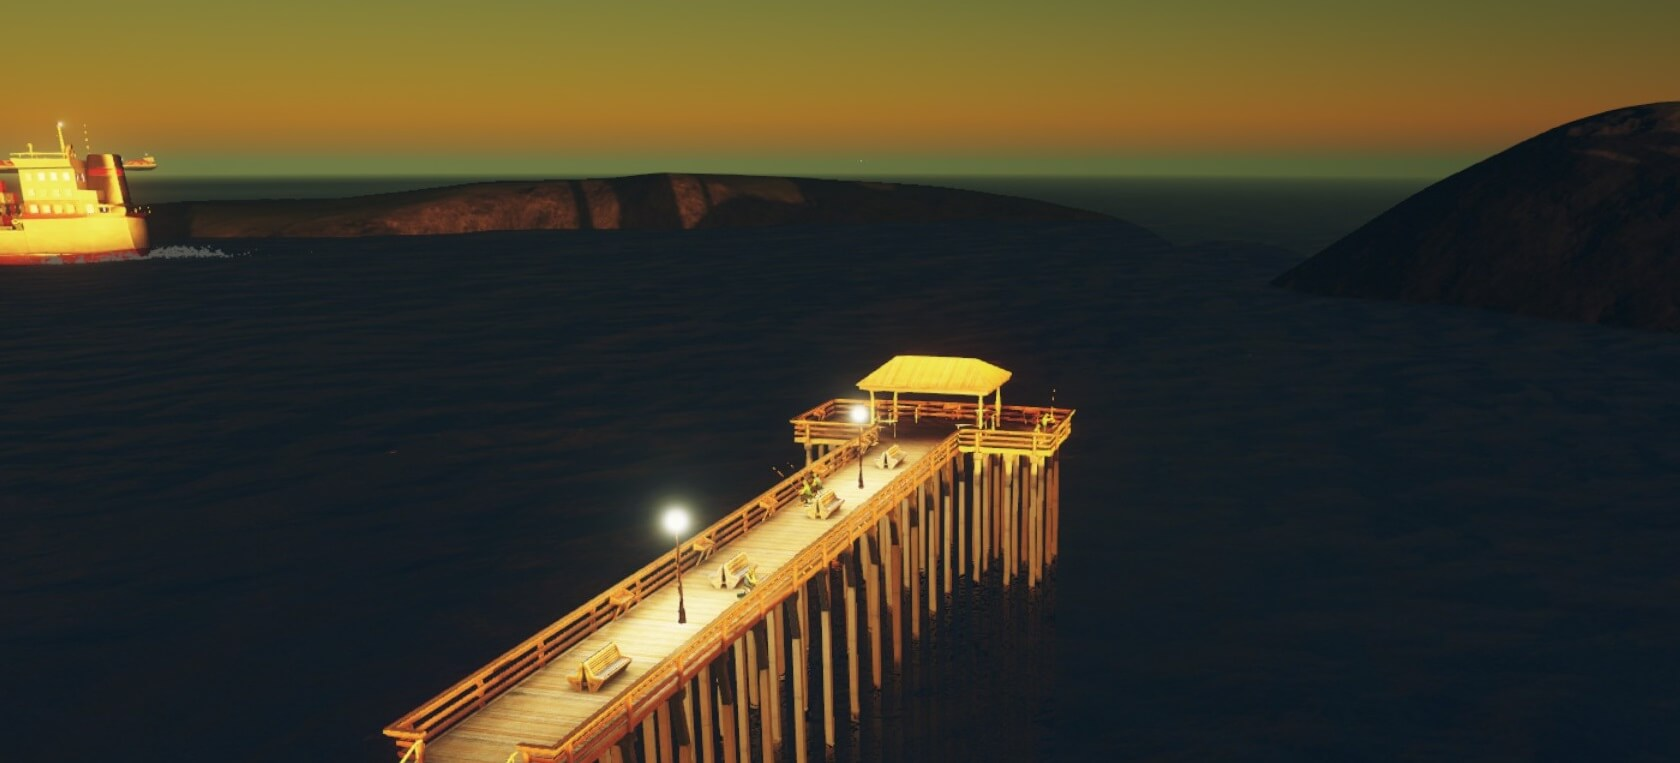 Cities:skylines夜明けの釣り桟橋